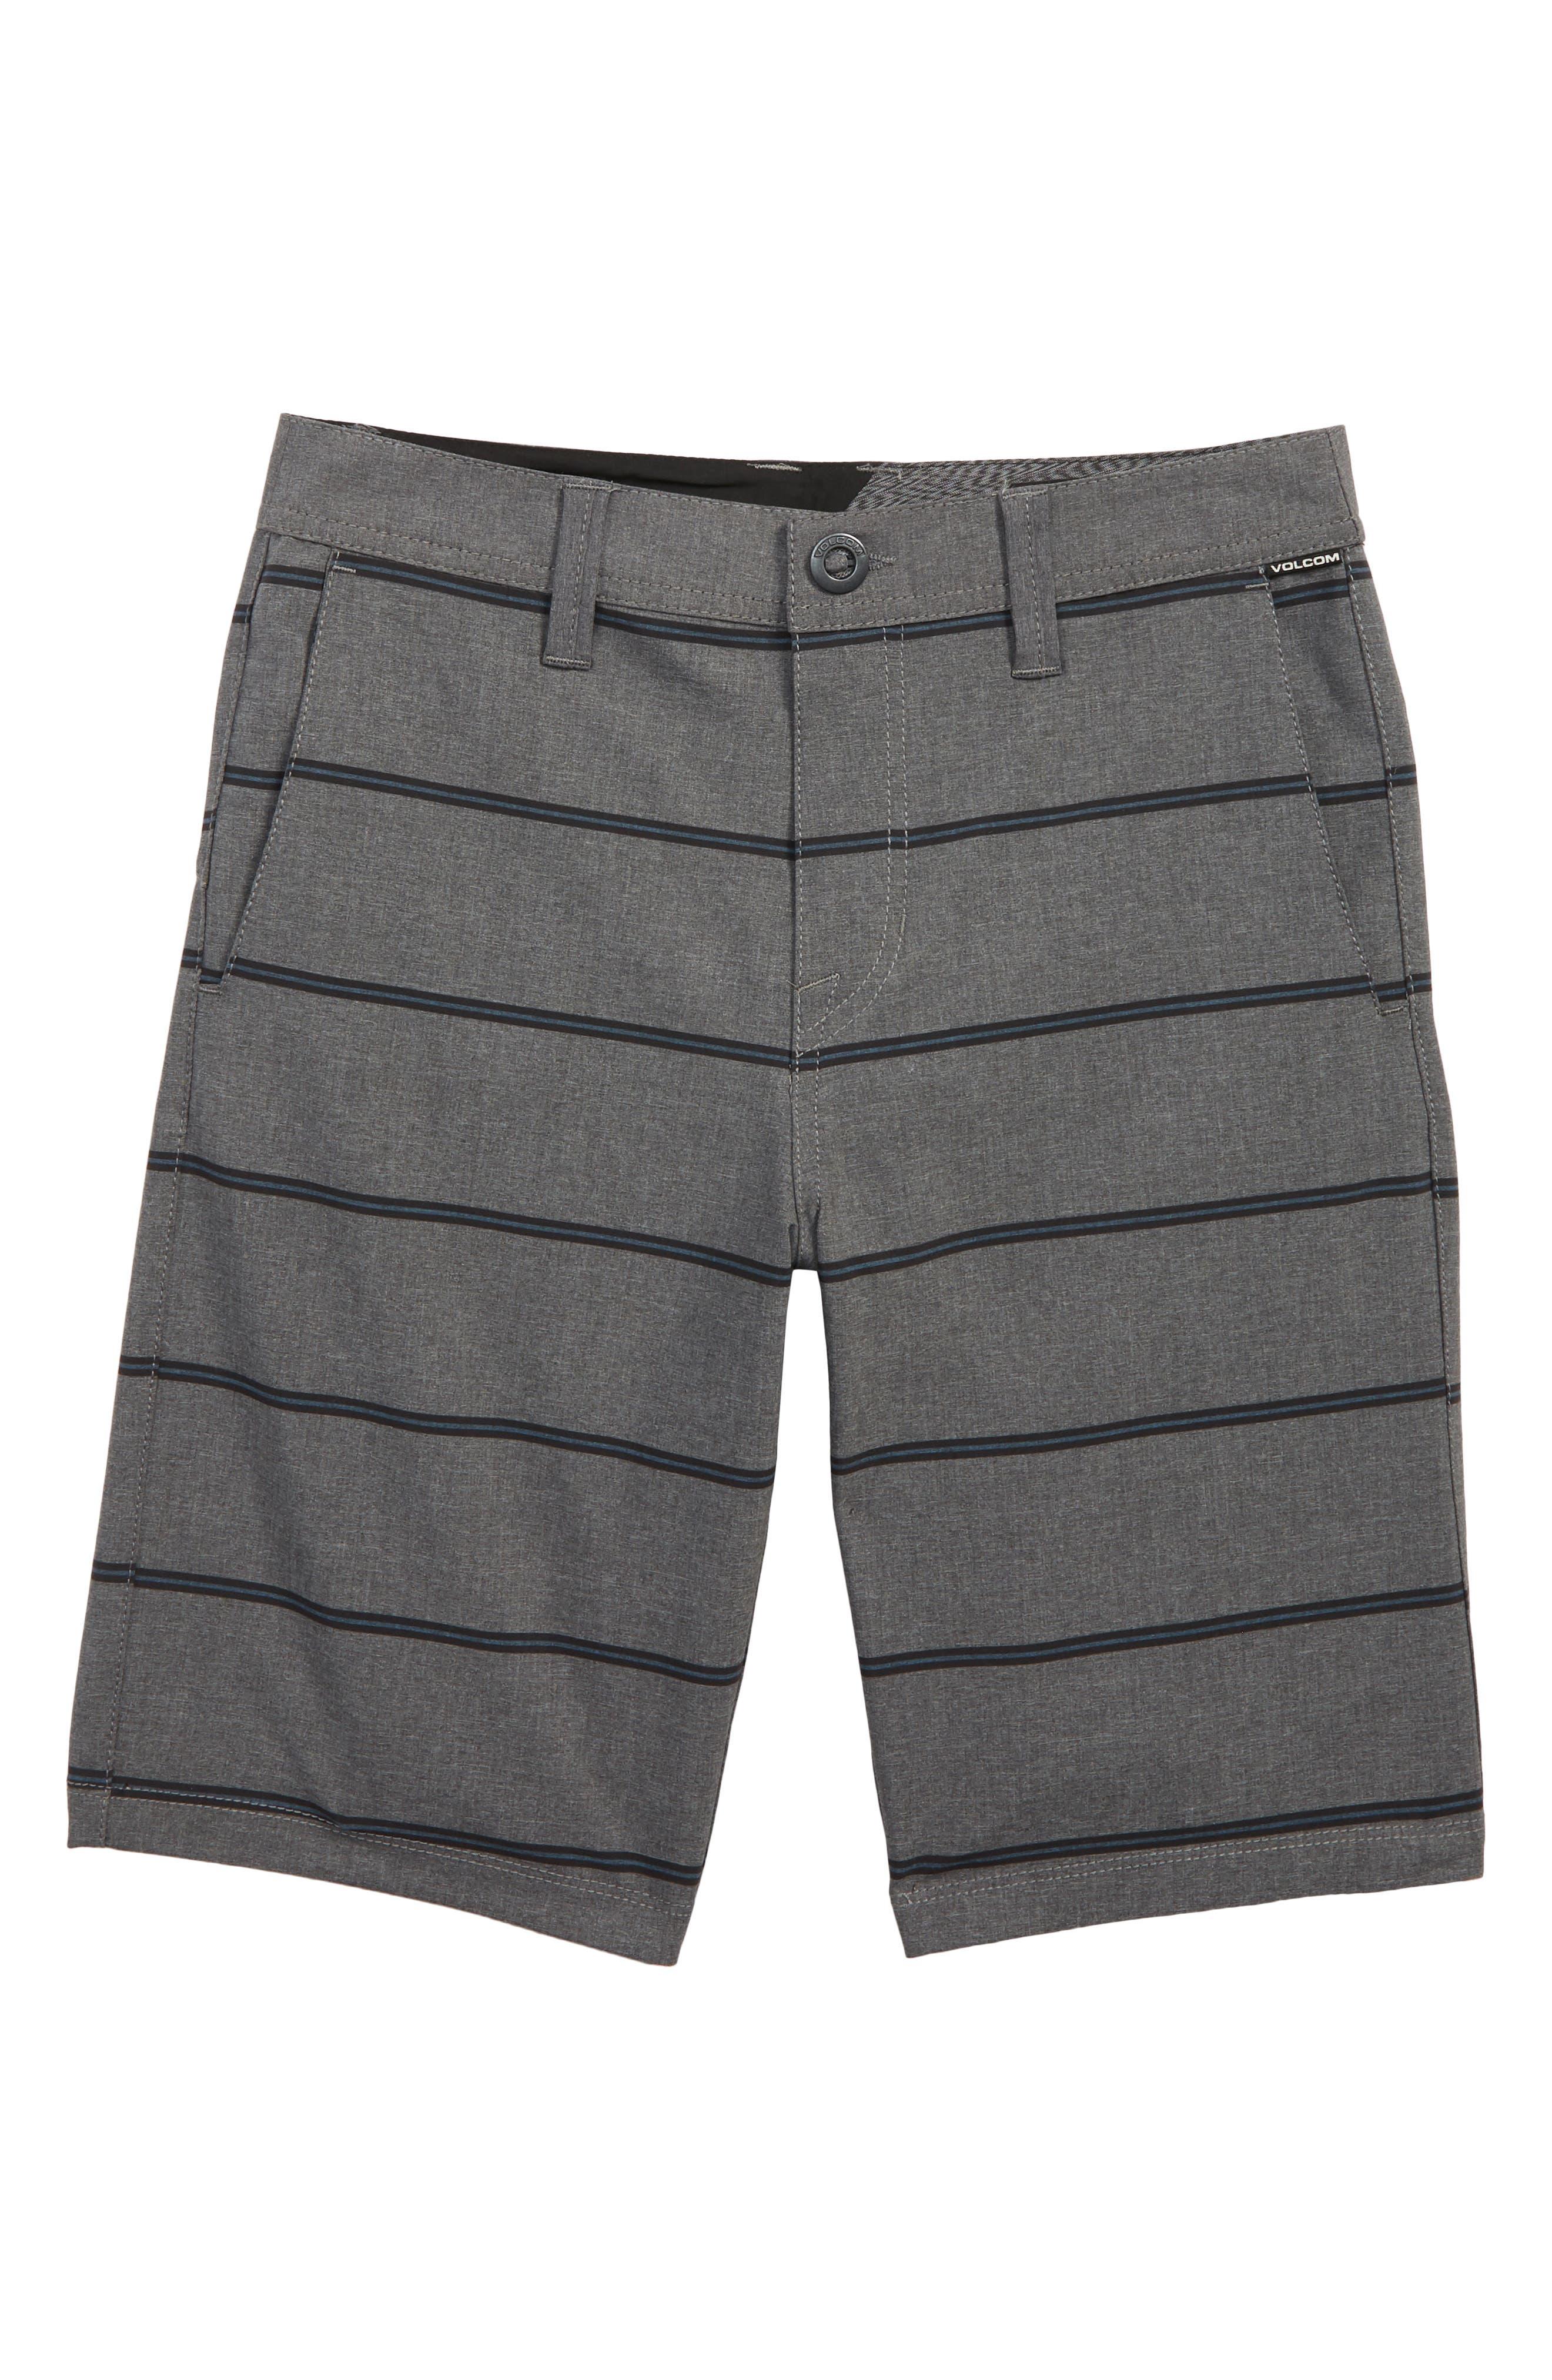 Frickin Surf N' Turf Mix Hybrid Shorts,                             Main thumbnail 1, color,                             GREY METAL